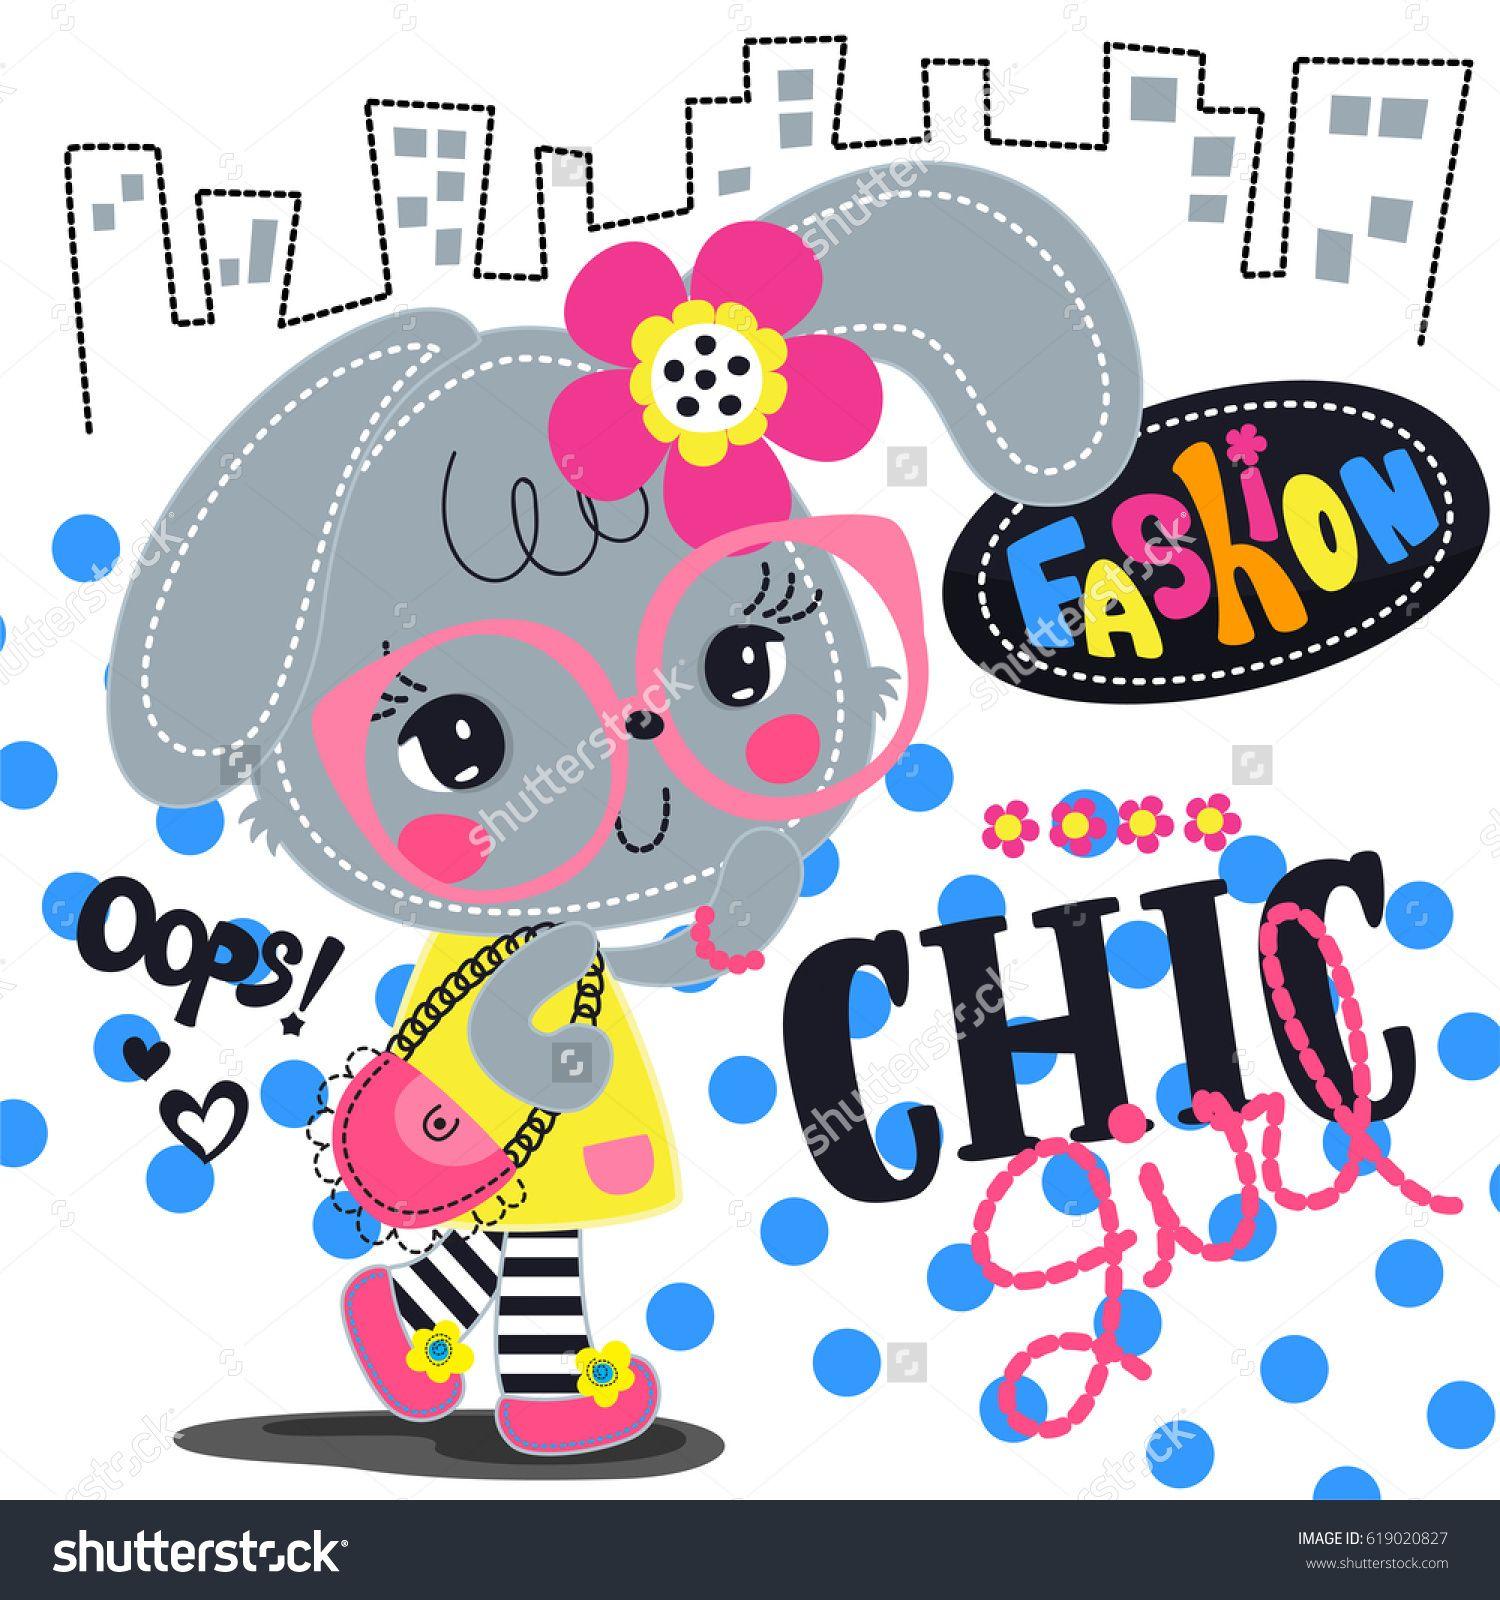 Cartoon beautiful rabbit girl wearing glasses and pink flower cartoon beautiful rabbit girl wearing glasses and pink flower headband with chic outfit walking in city izmirmasajfo